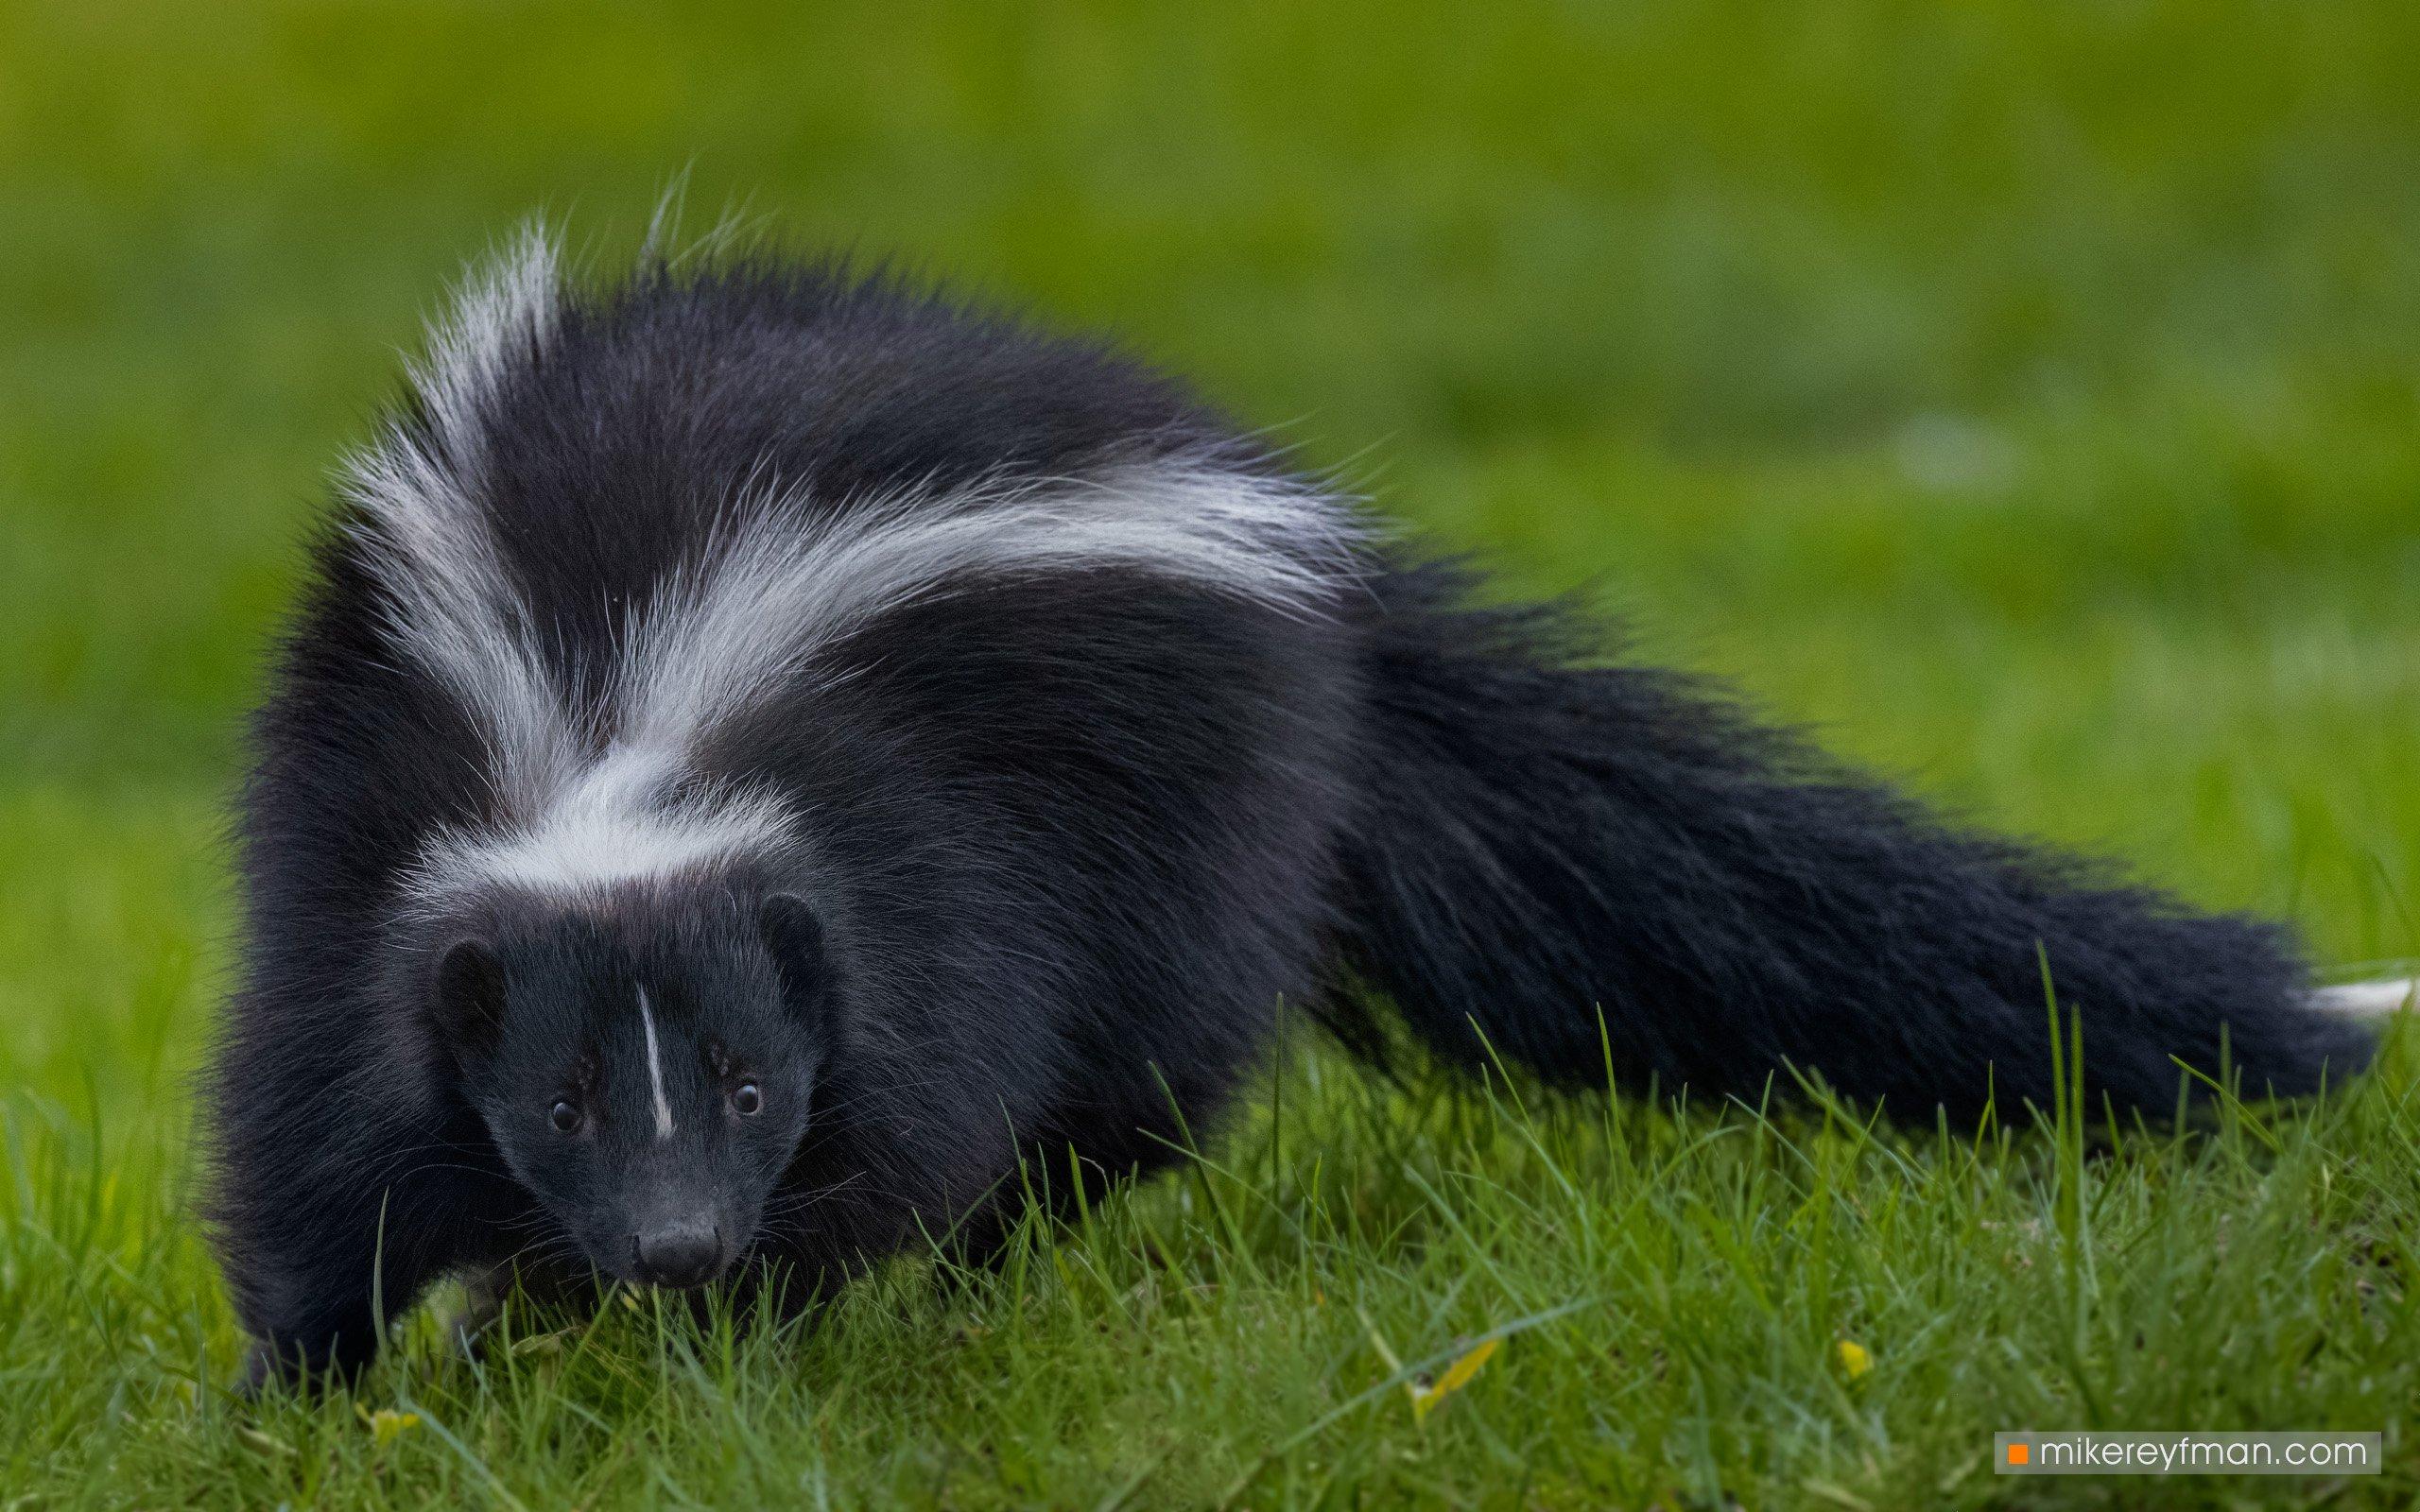 skunk, local wildlife, arlington club, wheeling, illinois, Майк Рейфман